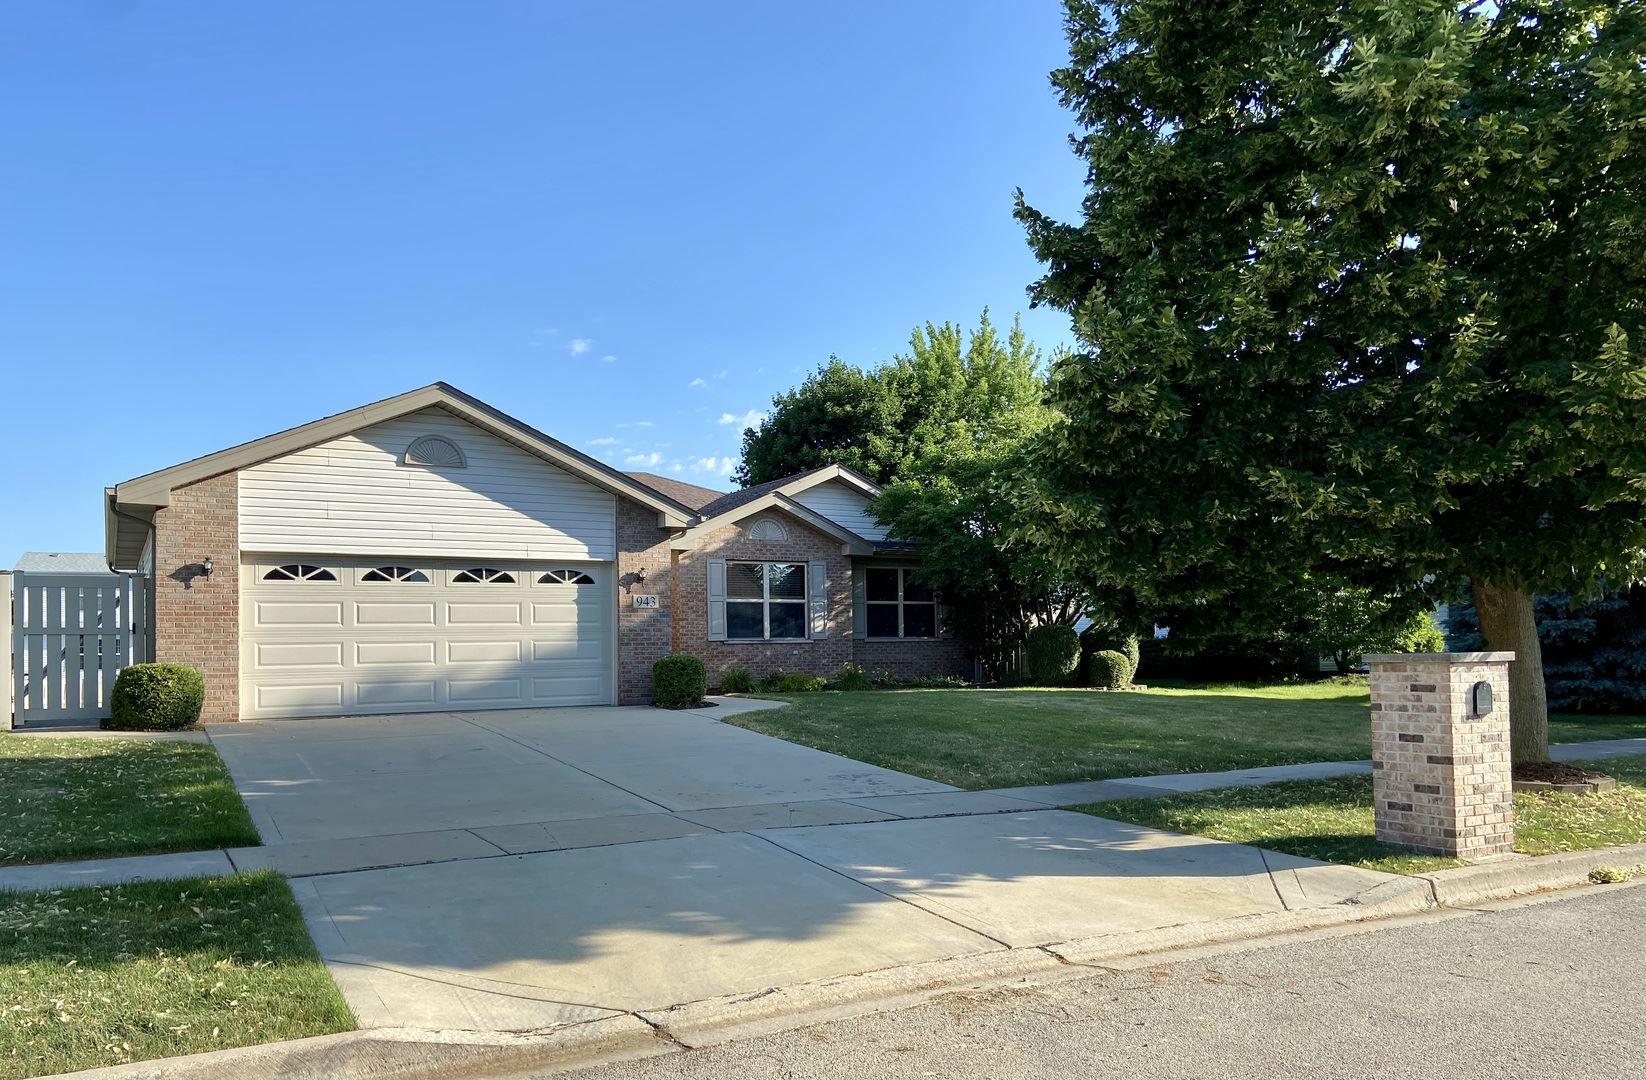 Photo of 943 Prairie Clover Drive, Romeoville, IL 60446 (MLS # 11123894)